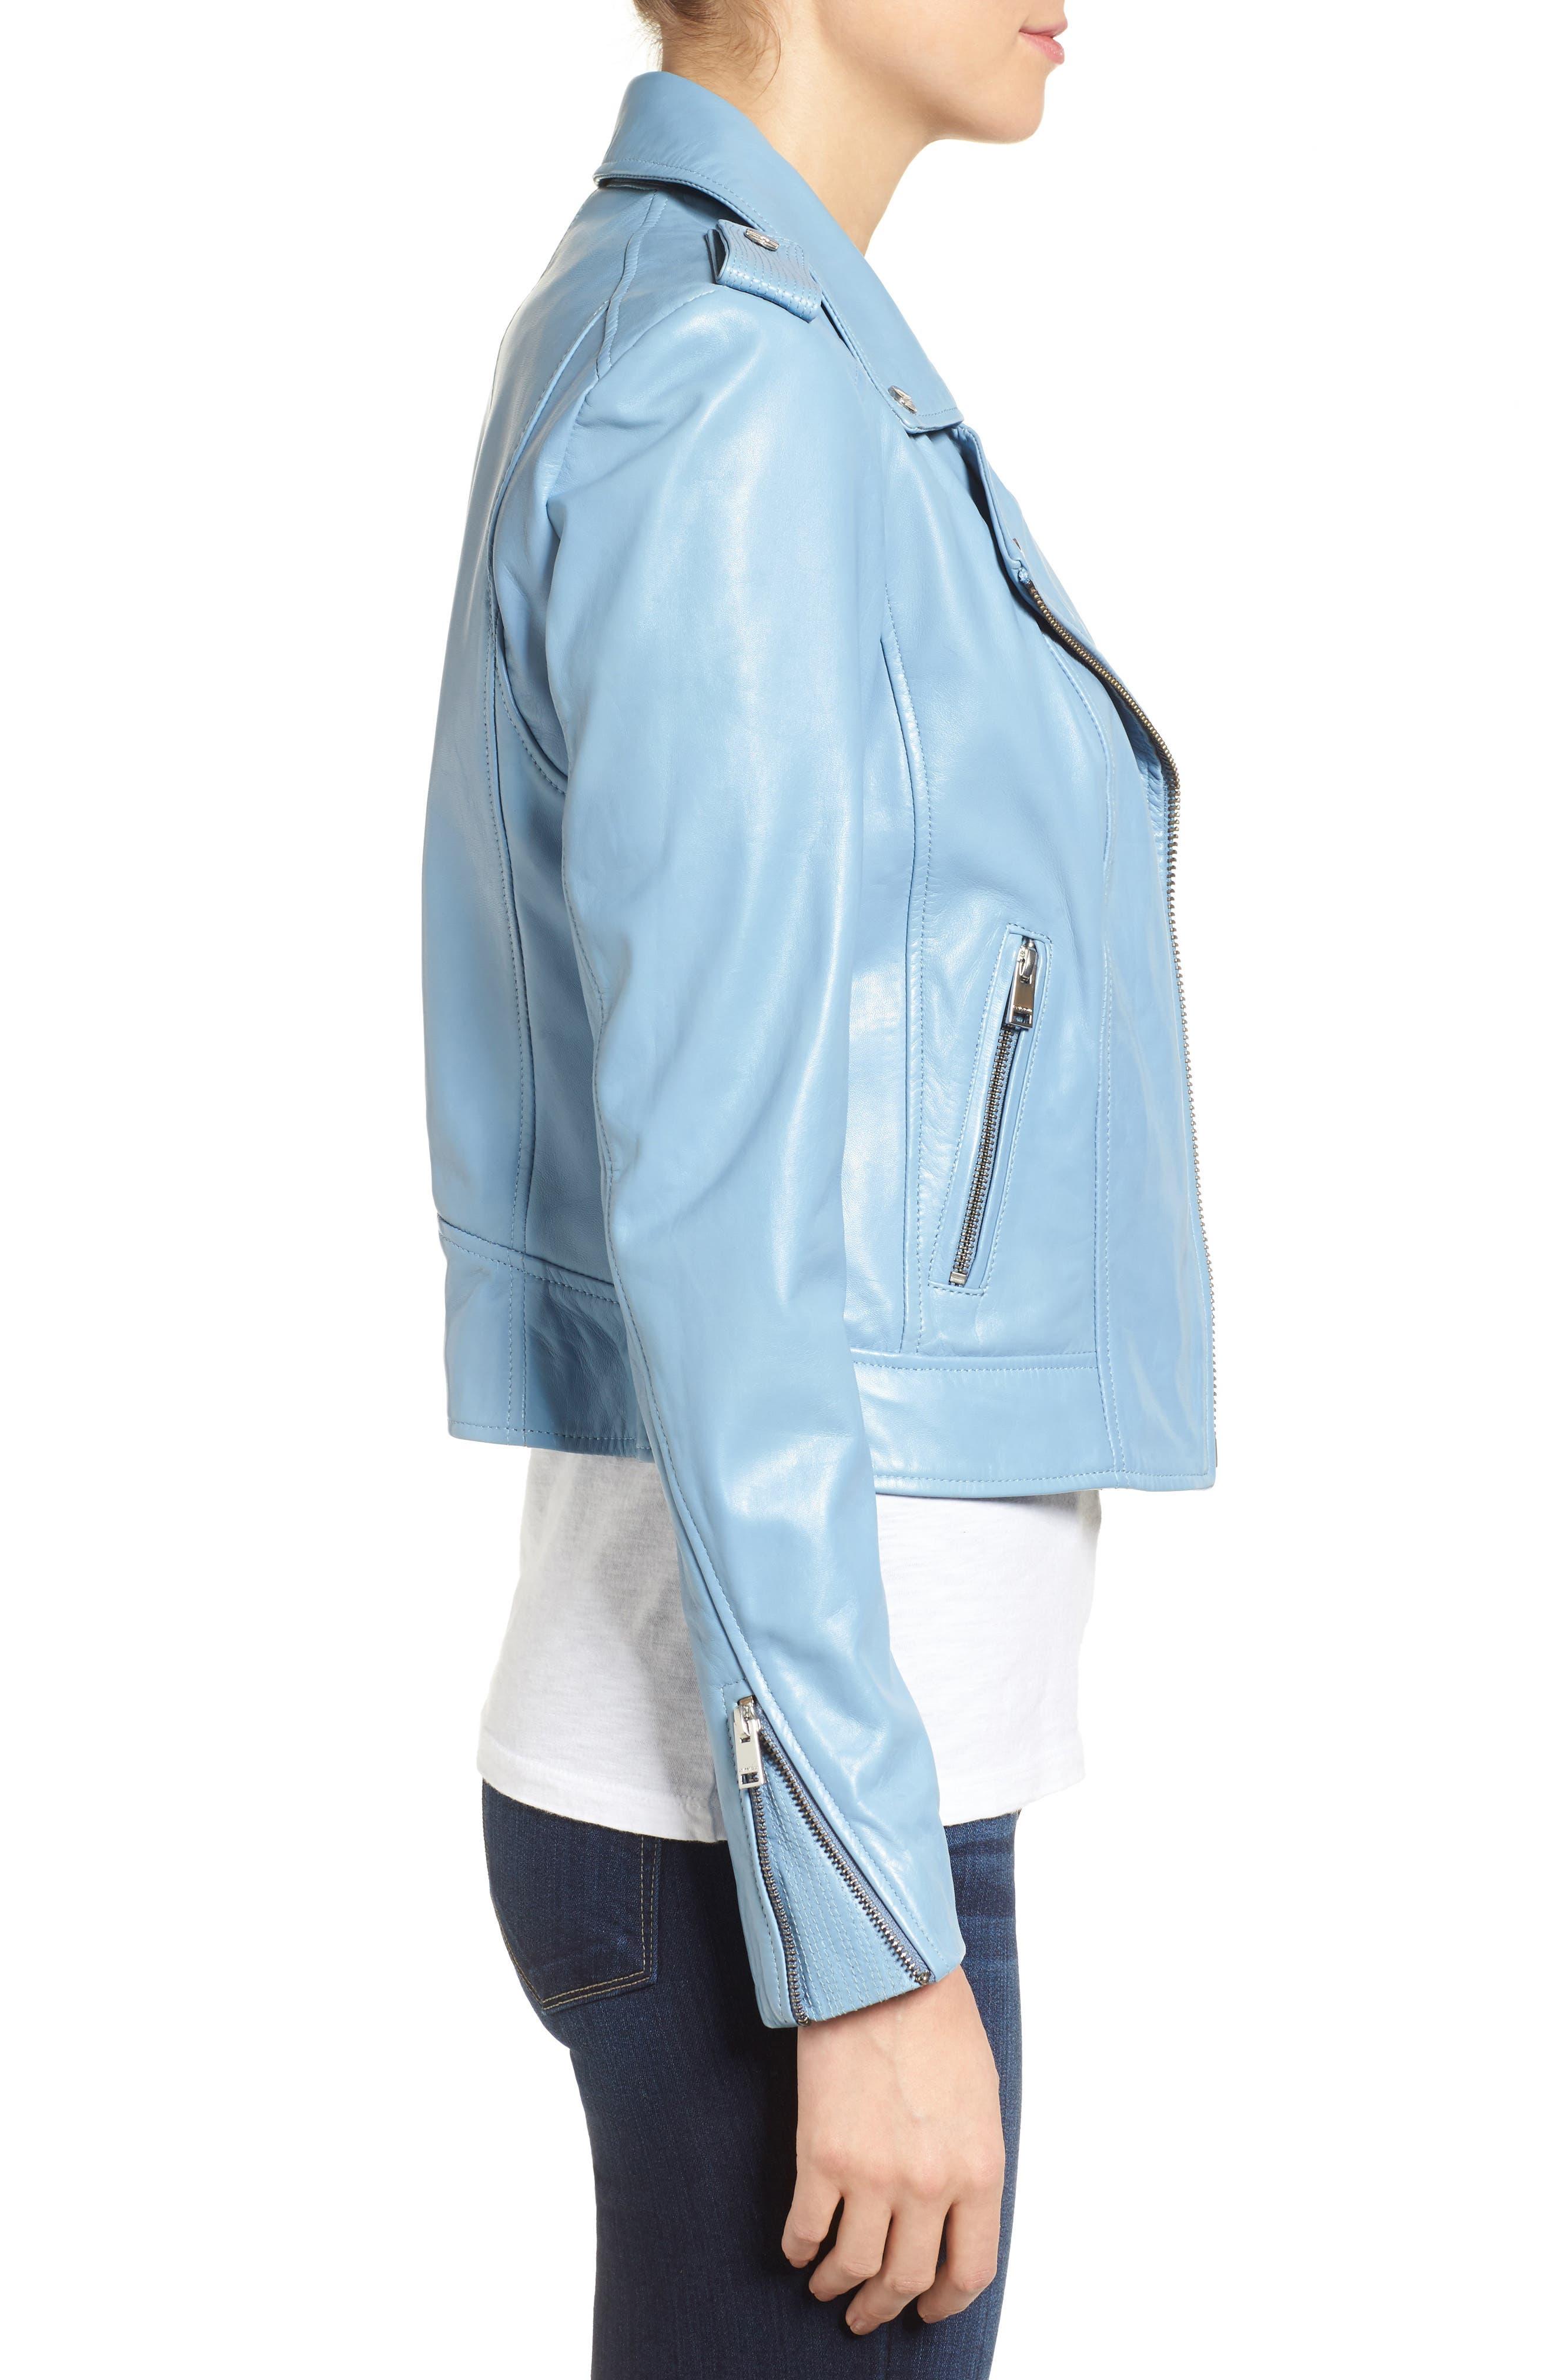 Donna Lambskin Leather Moto Jacket,                             Alternate thumbnail 3, color,                             POWDER BLUE